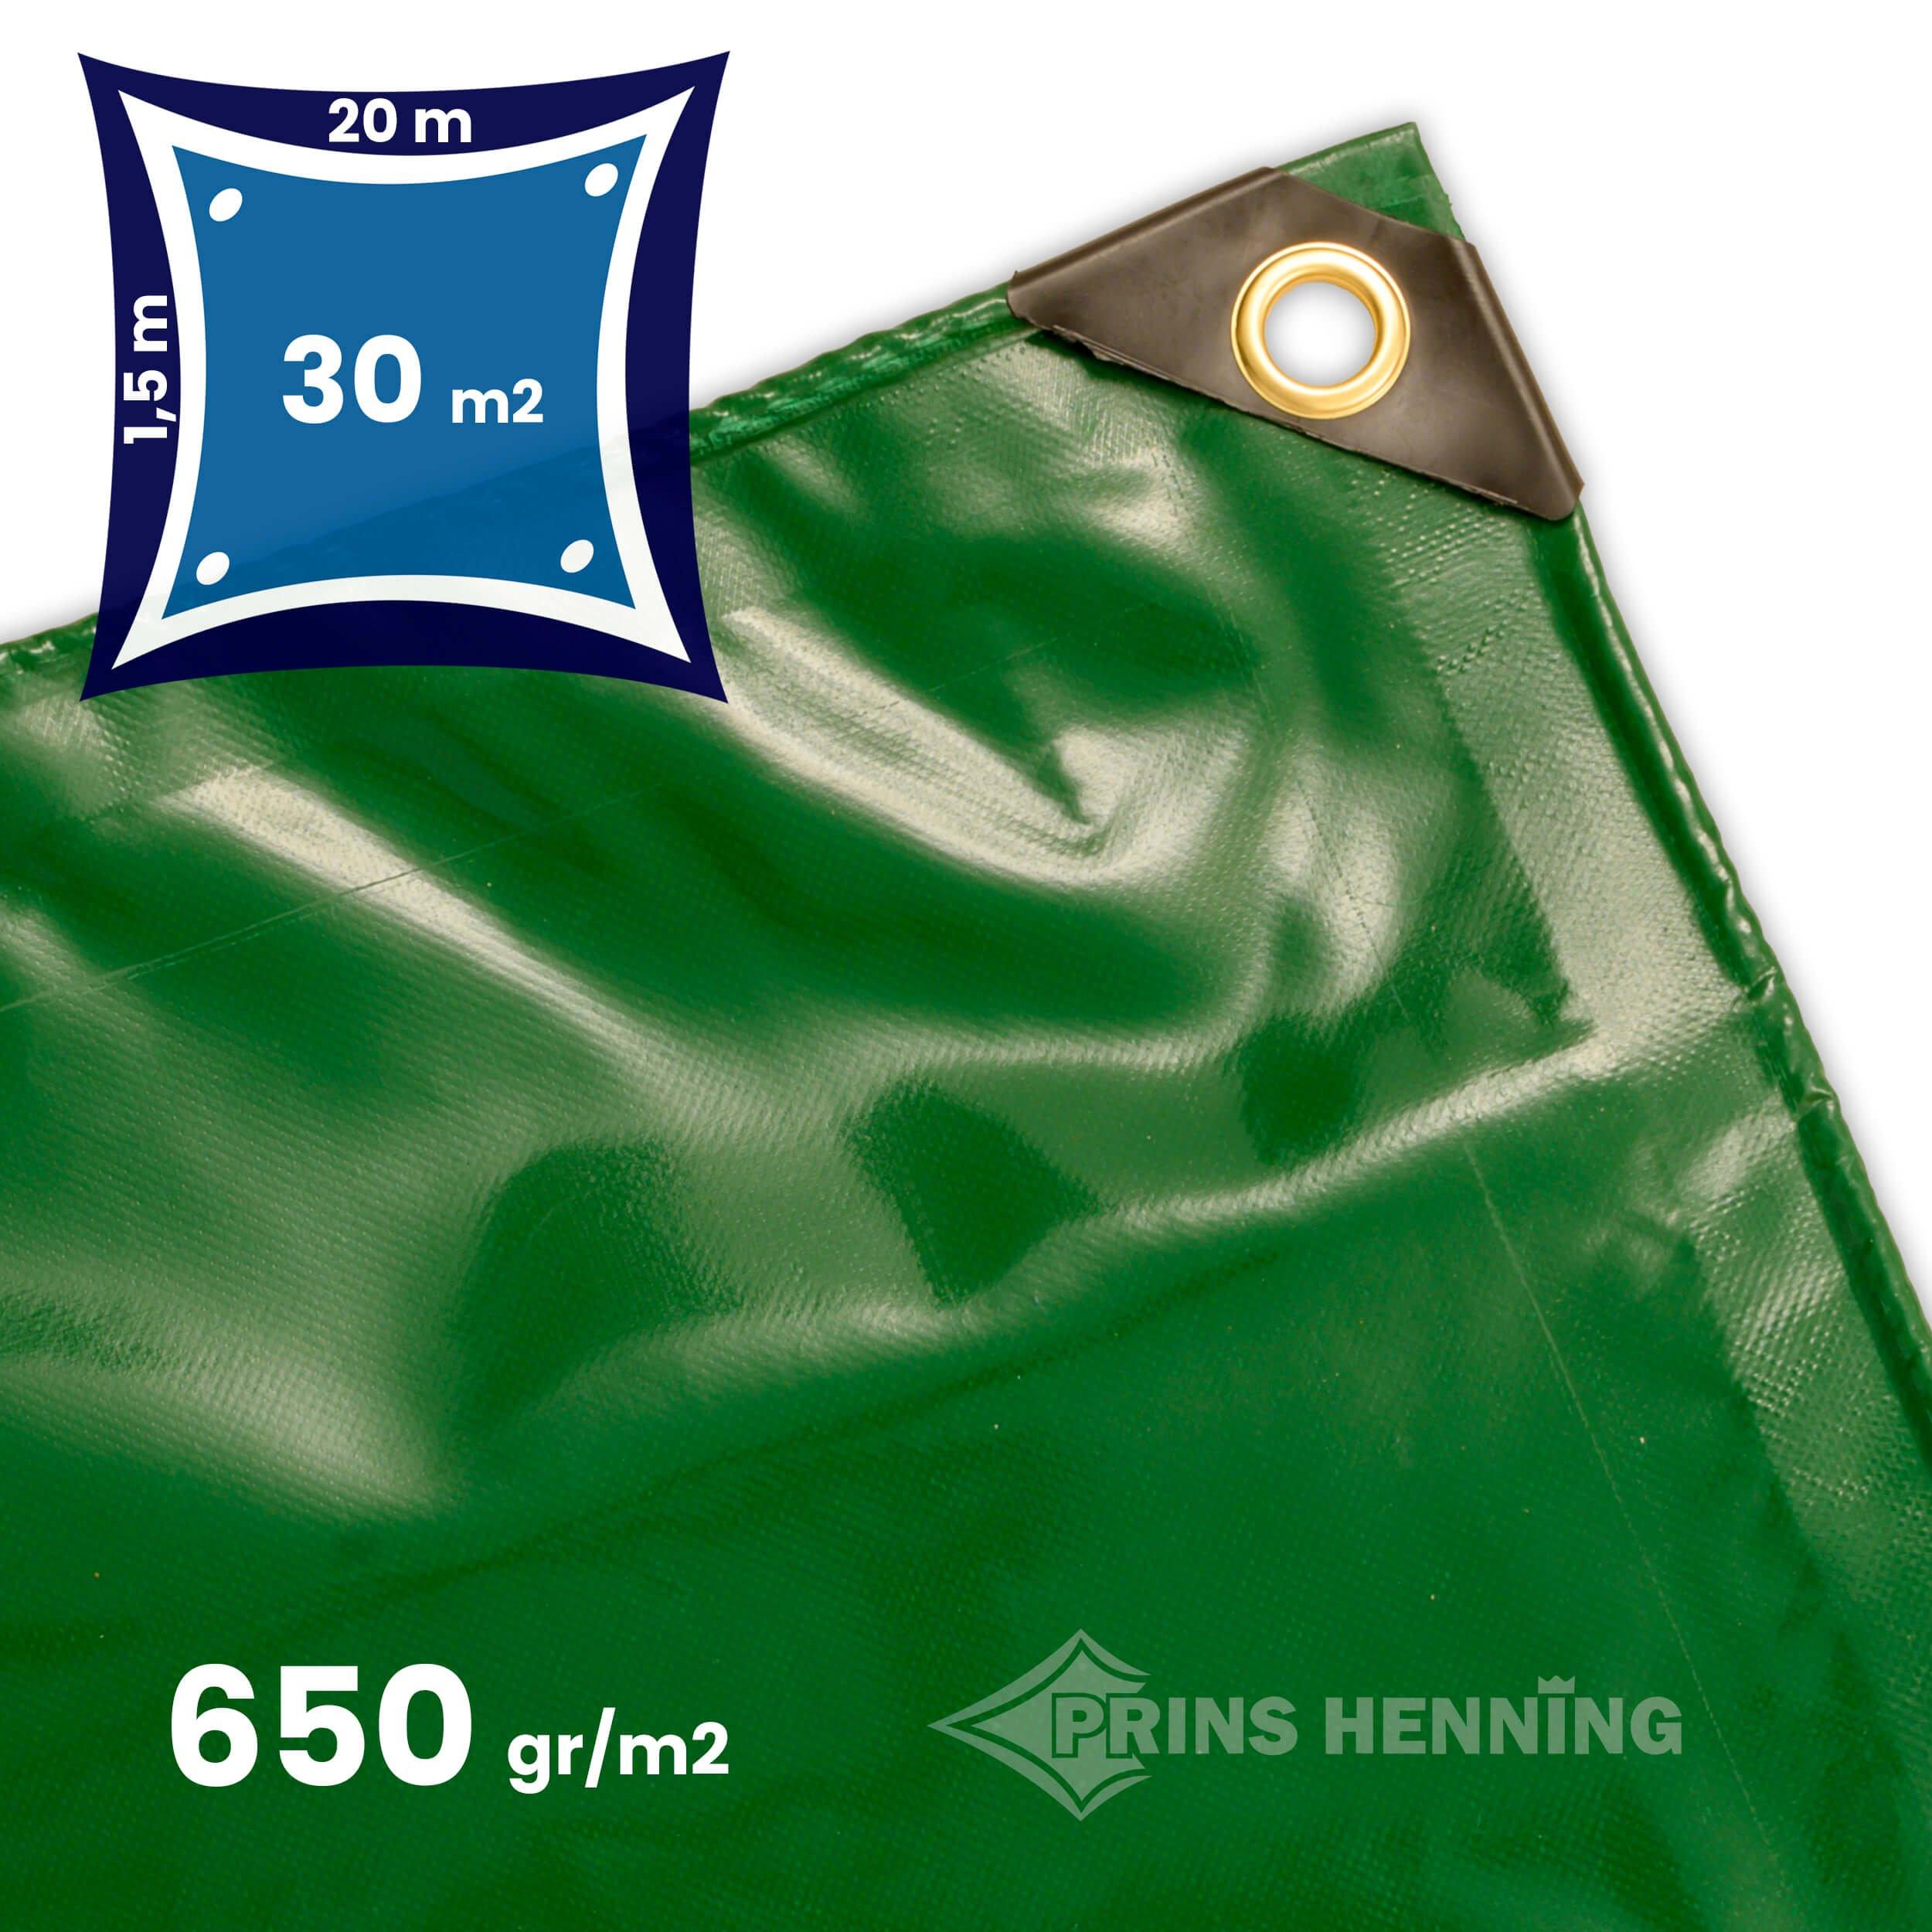 Professionel  presenning, 1,5x20 meter, grøn, kraftig kvalitet, 650 gr/m2